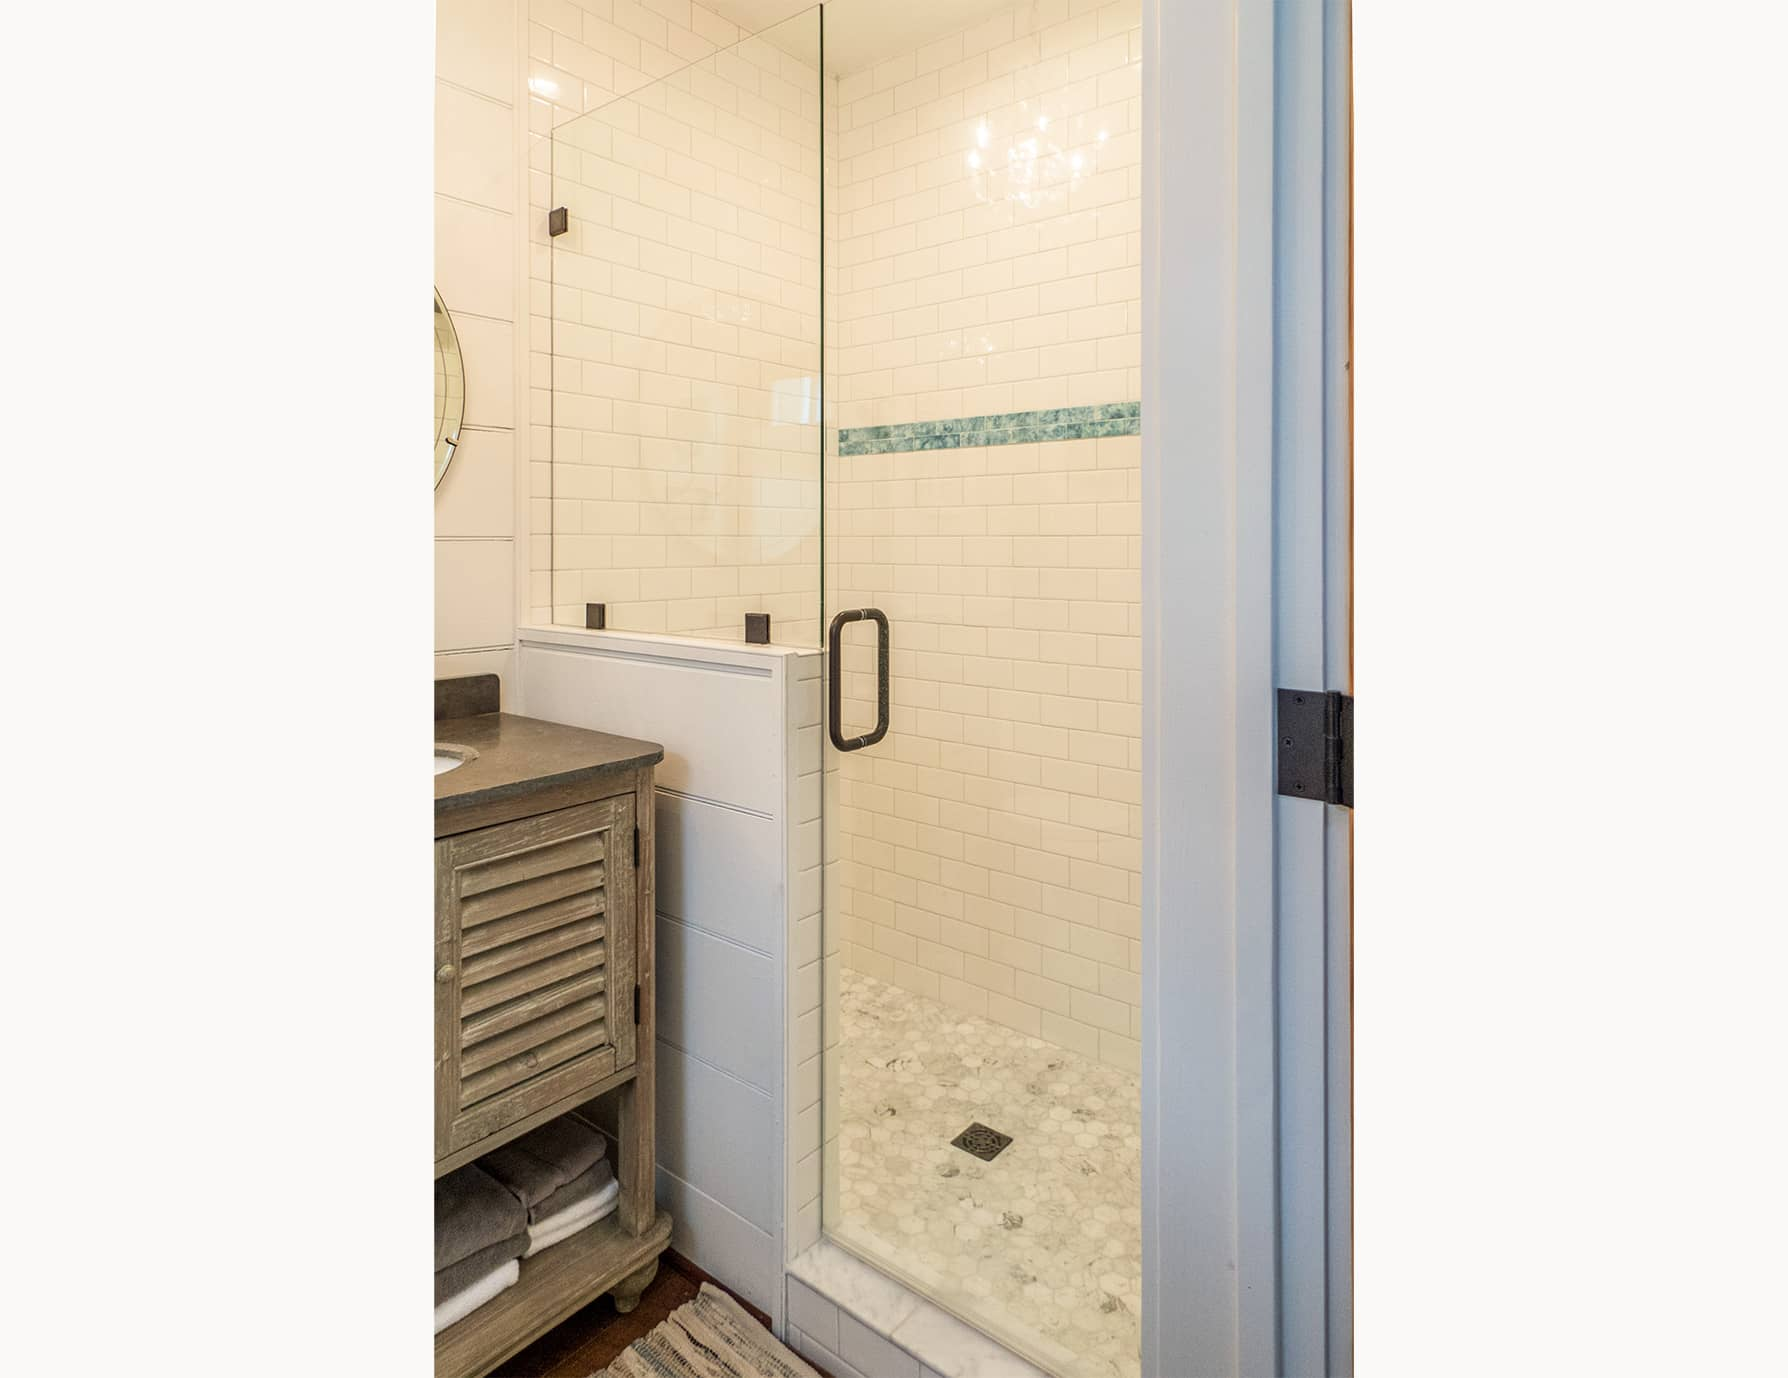 Vacation Rental Bathroom - Shenandoah Valley